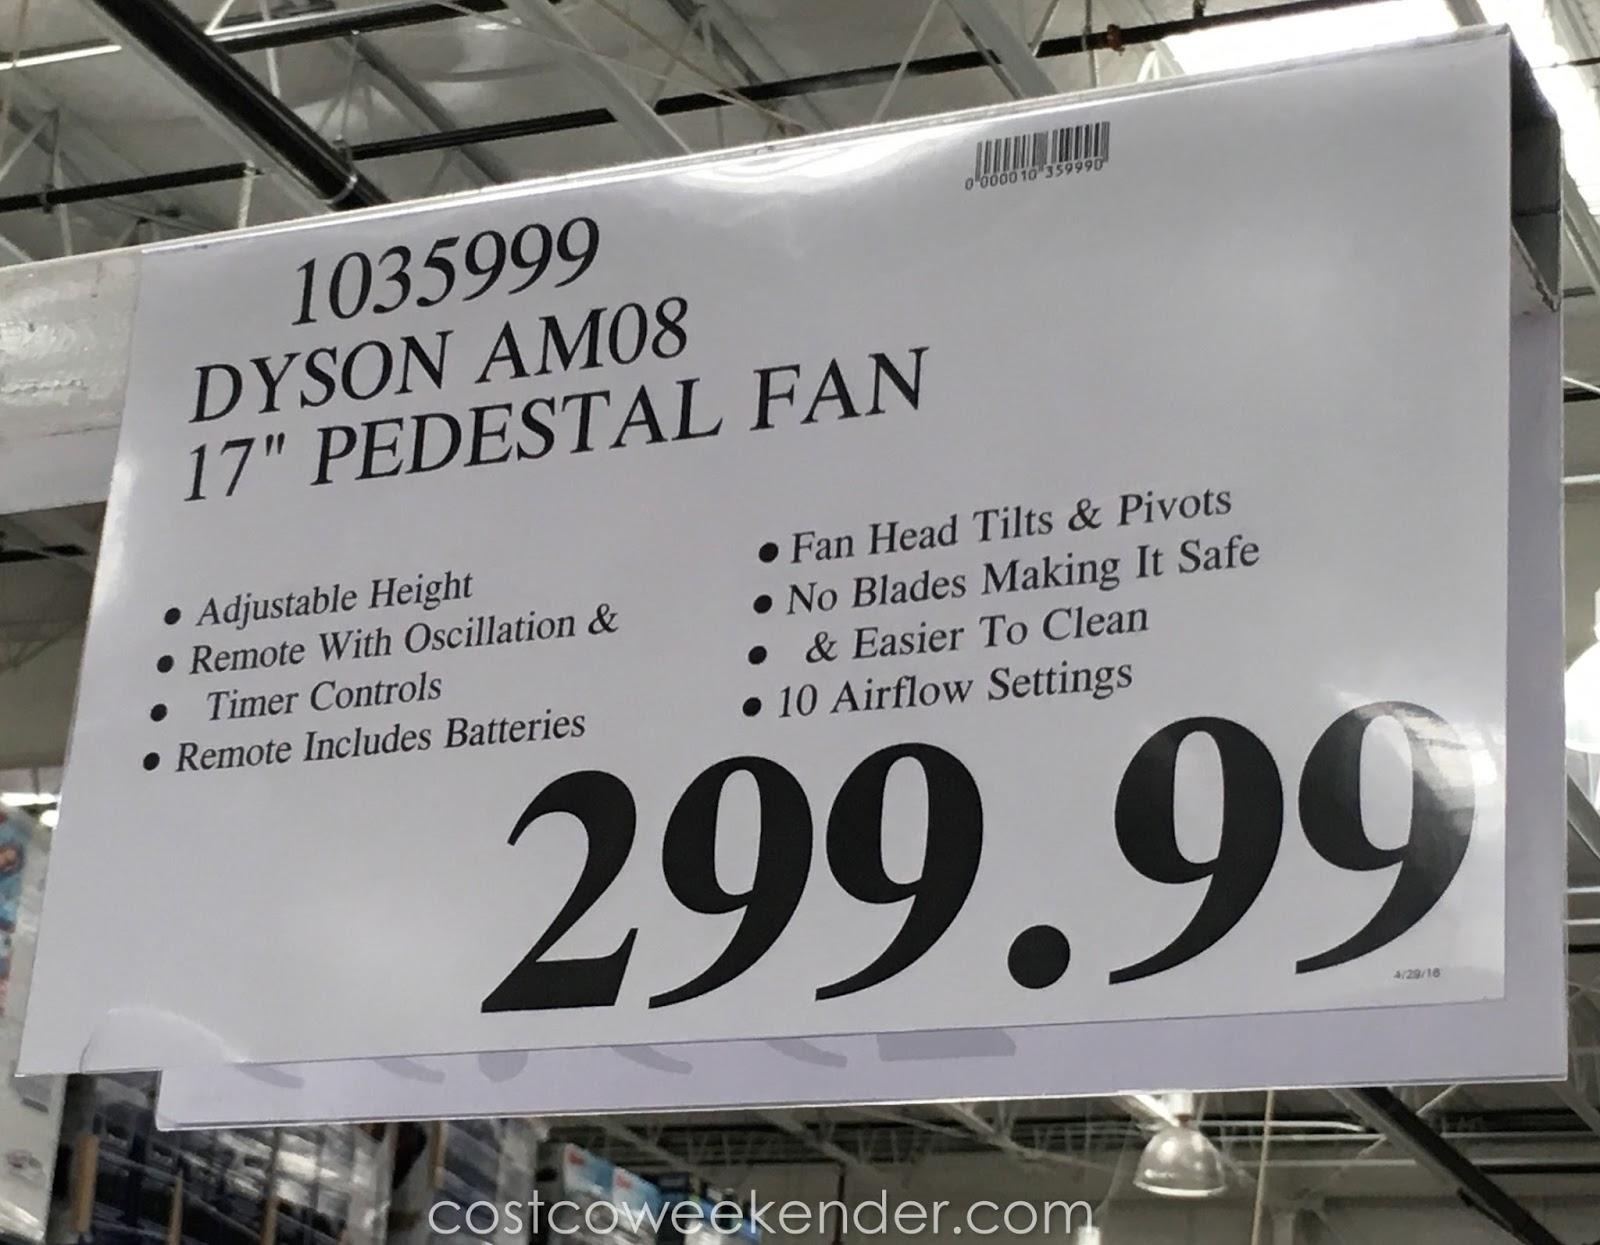 fans fan heating silver heightadjust white small pedestal appliances dyson whitesilver